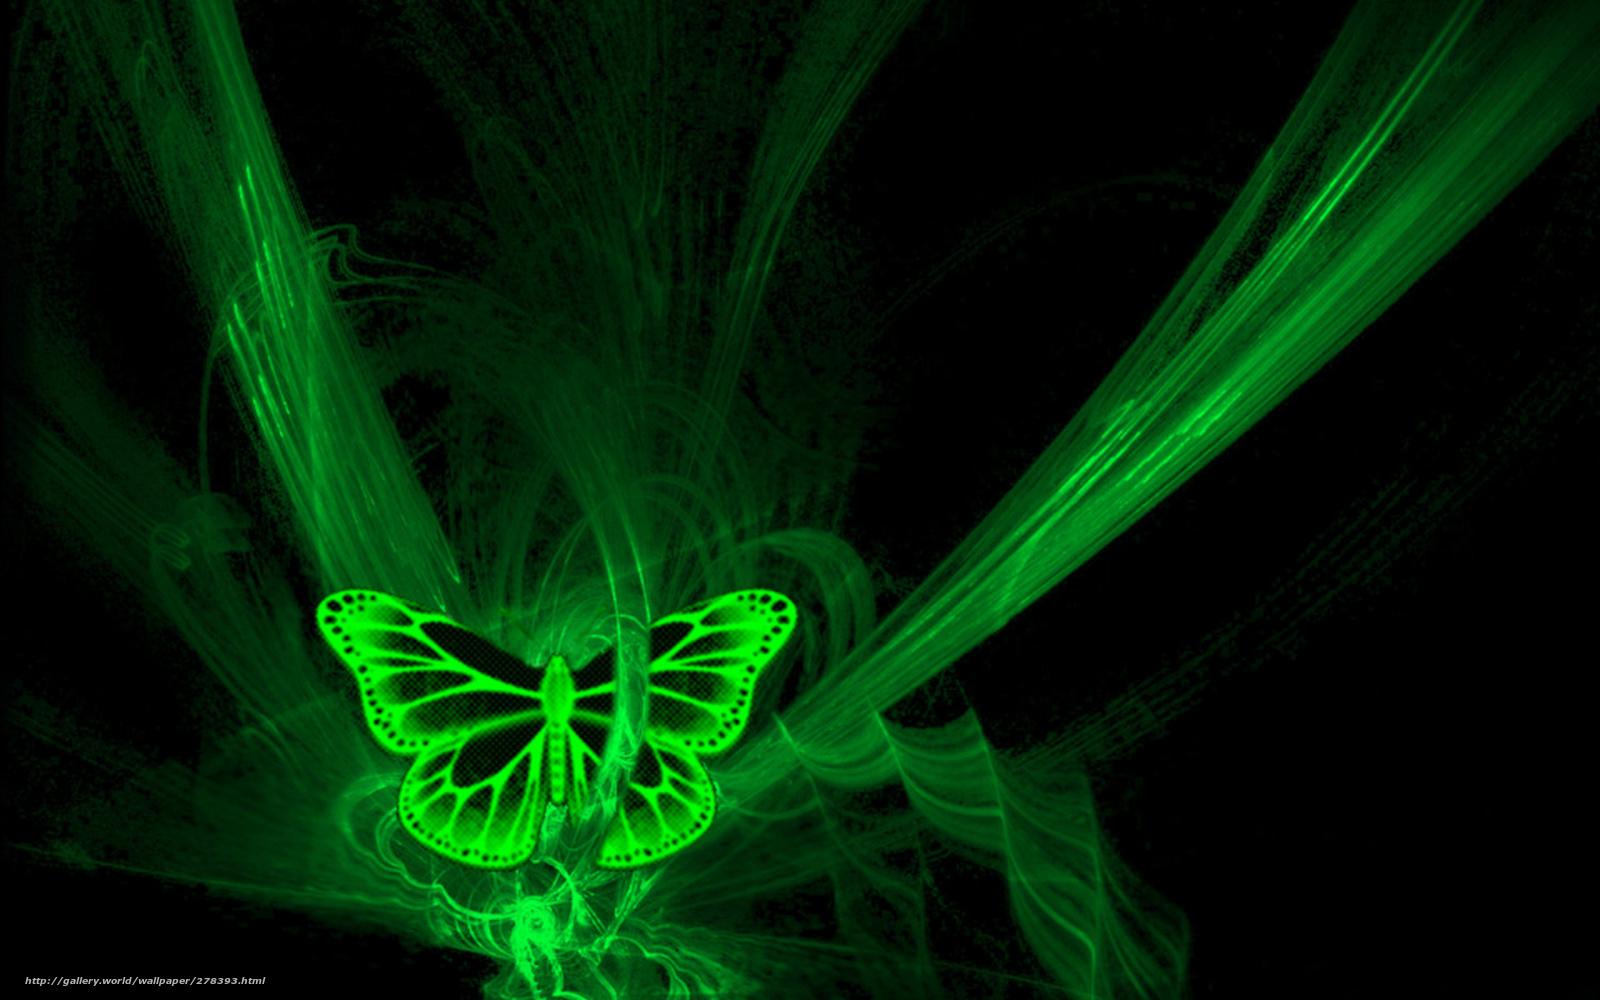 Free Download Wallpaper Butterfly Neon Black Green Desktop Wallpaper 1600x1000 For Your Desktop Mobile Tablet Explore 75 Green Neon Wallpaper Neon Blue Wallpapers Neon Green Hd Wallpaper Hd Abstract Neon Wallpapers